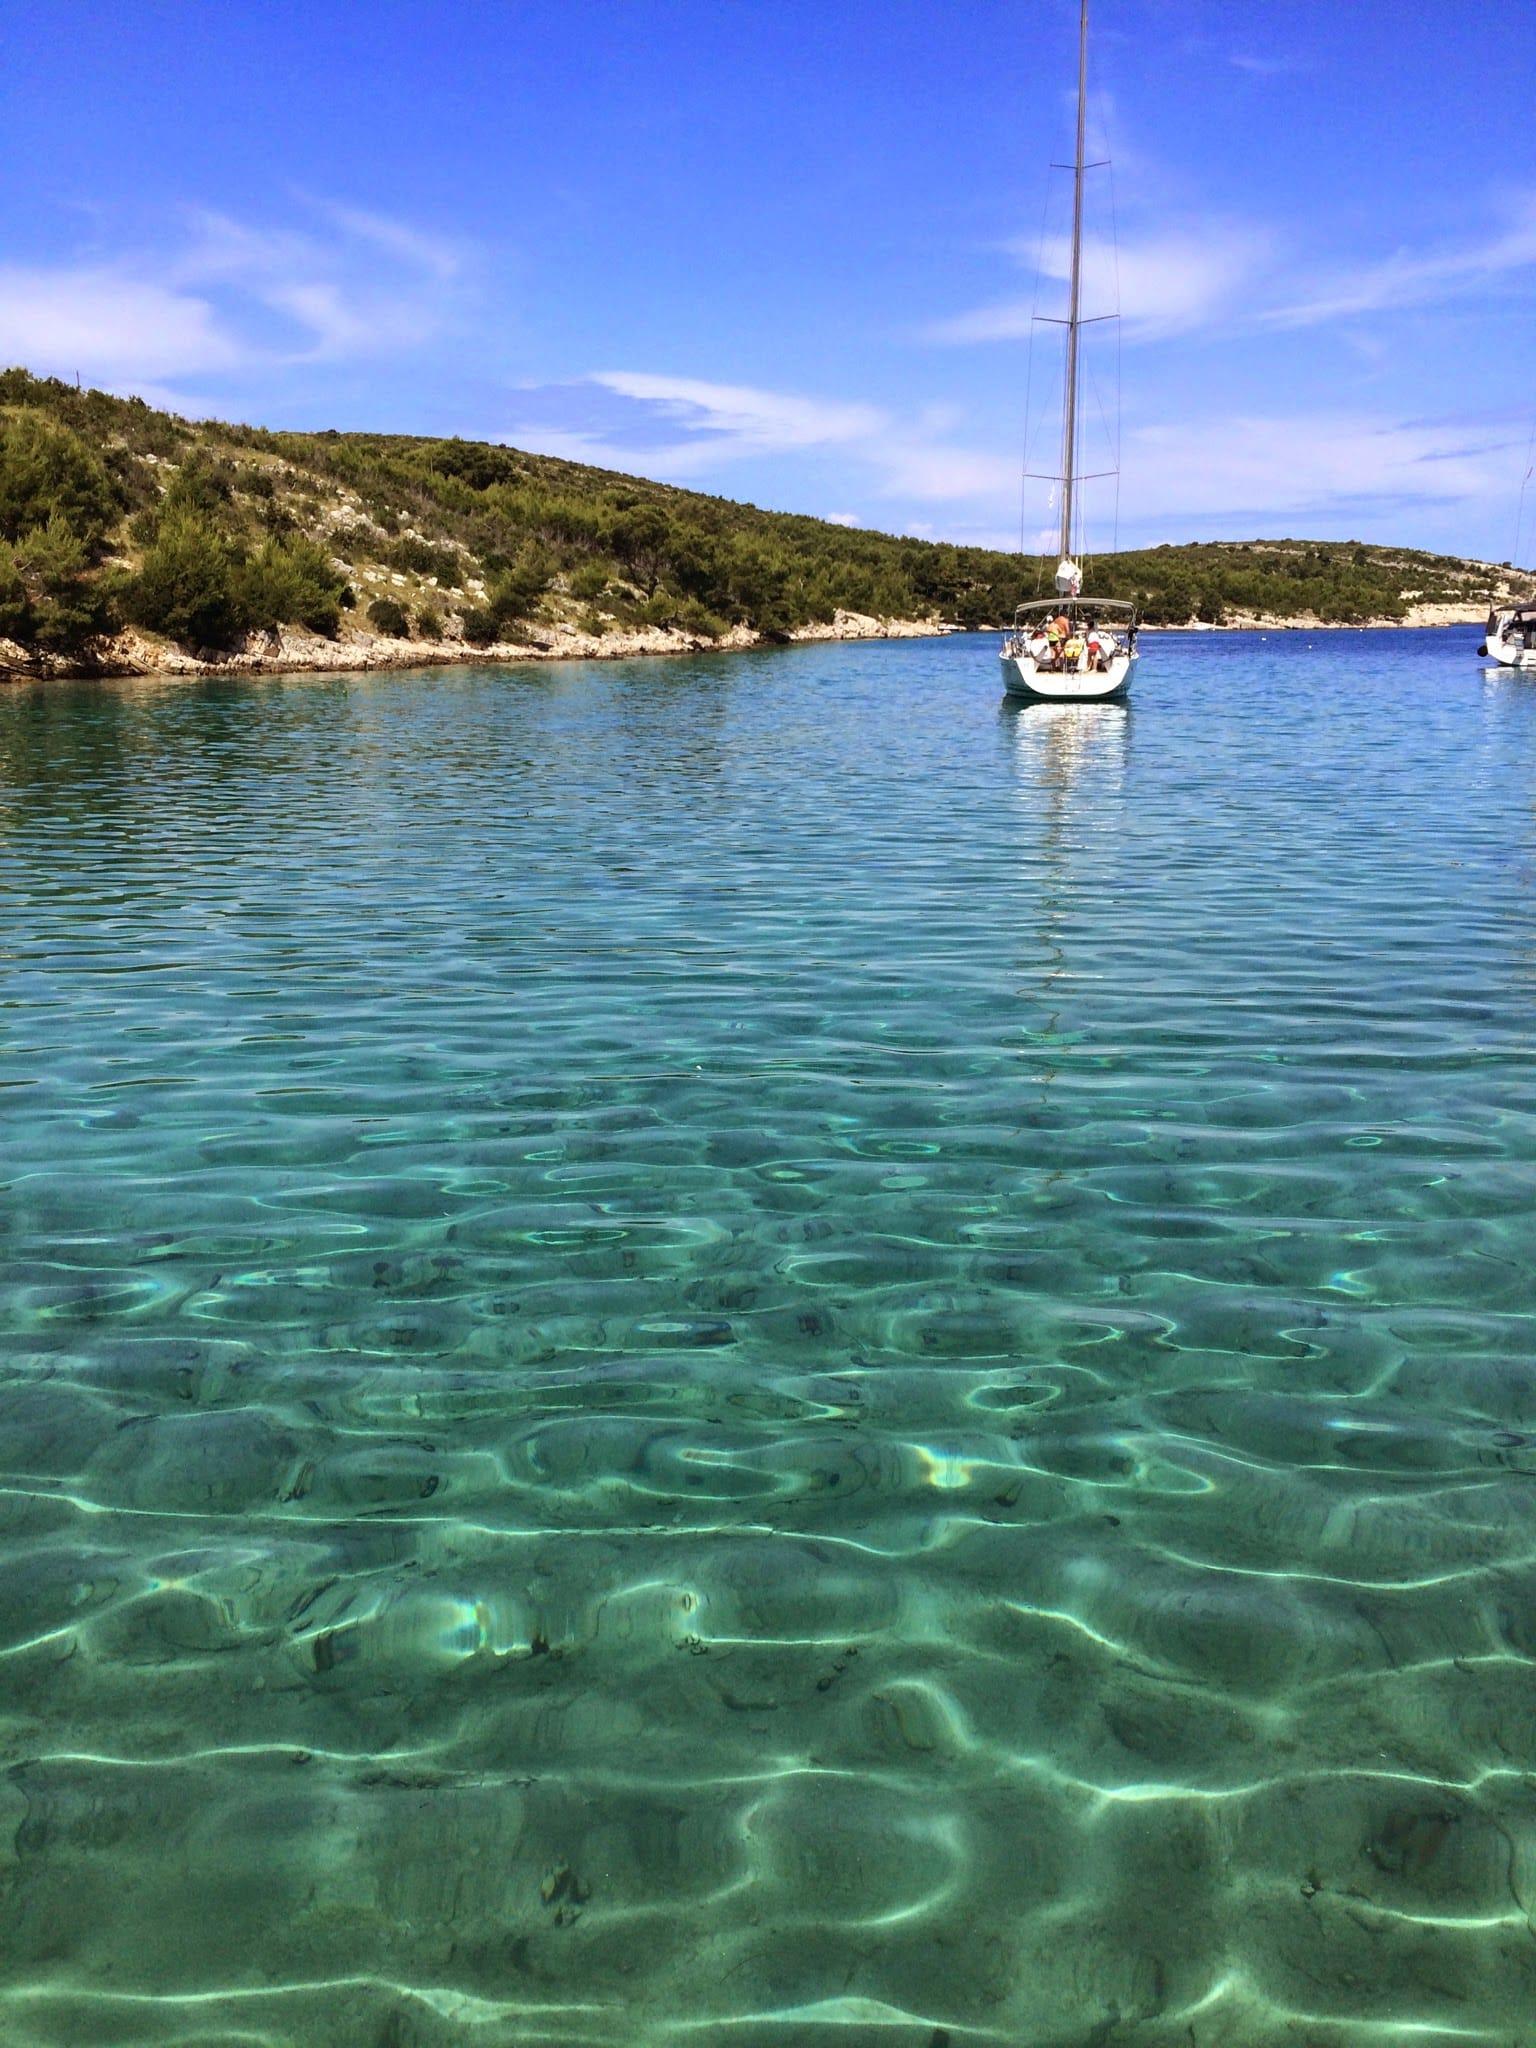 Where to go on holiday - Croatia